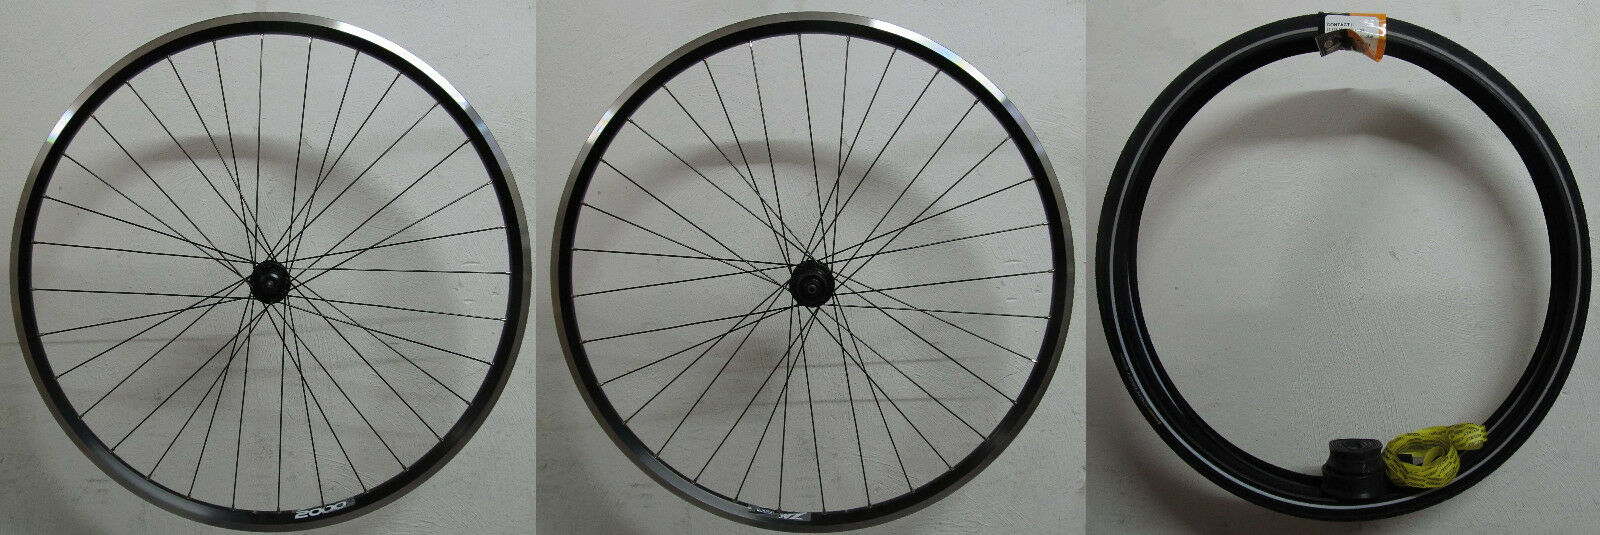 Shimano Alivio T4000 T4000 T4000 Ryde Zac 2000 Set Ruote Bicicletta 28   Trekking V-Br 443bac